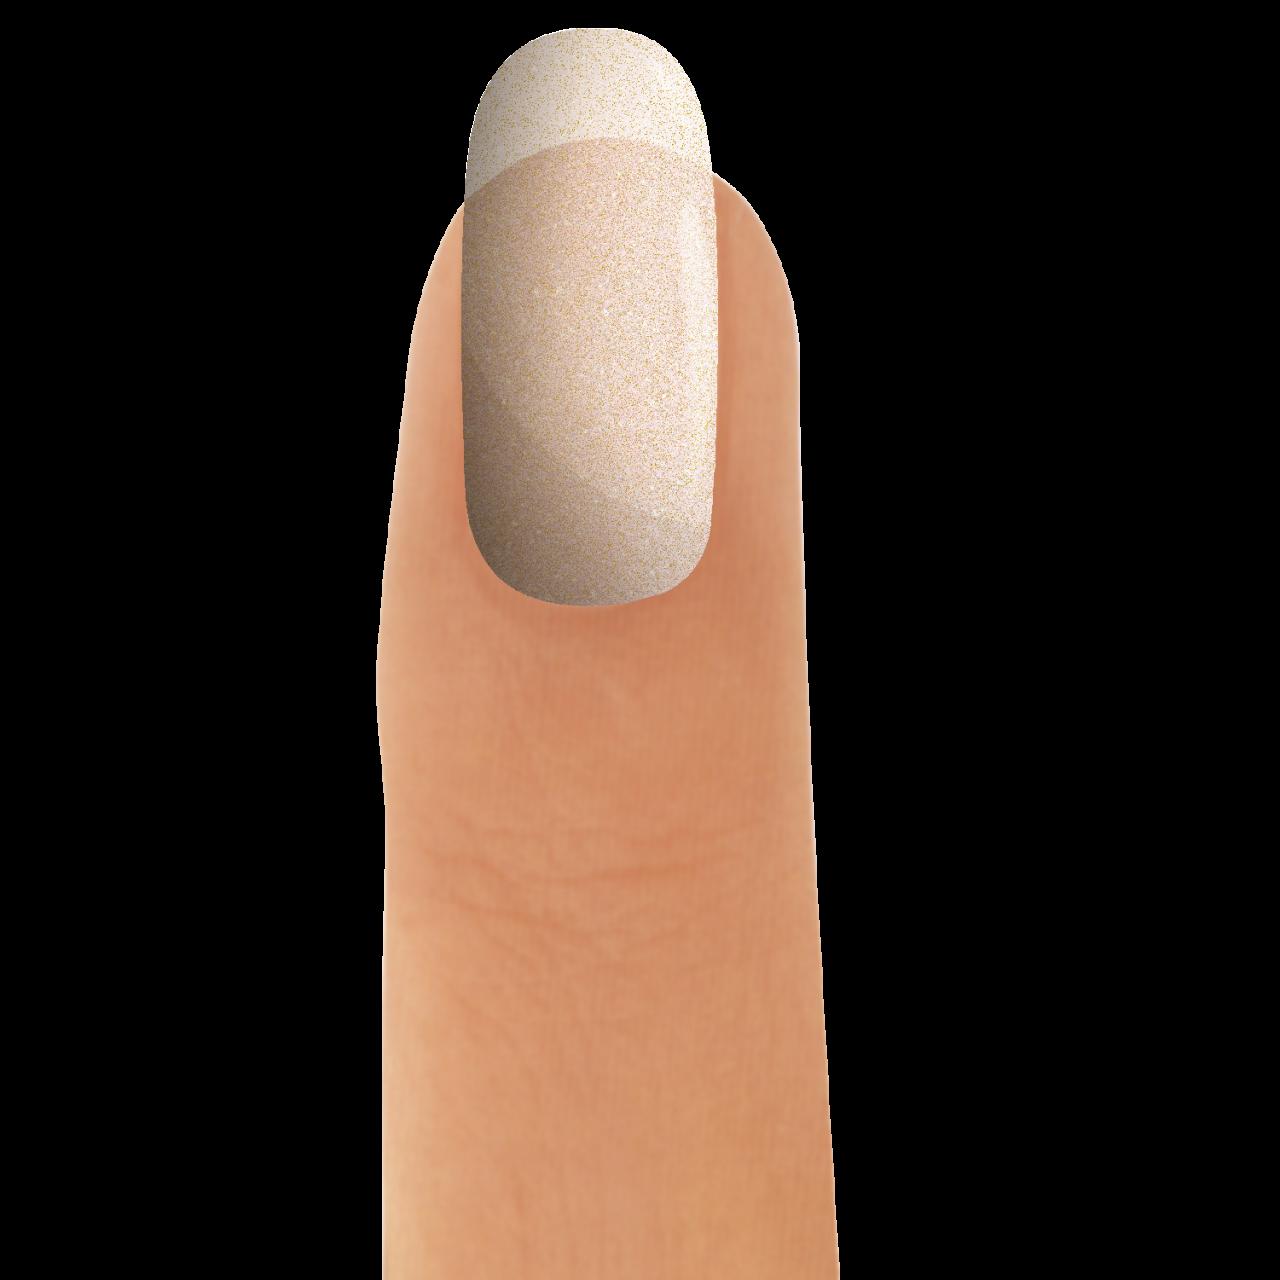 3in1 UV-Nagellack Glitter Prosecco 12 ml